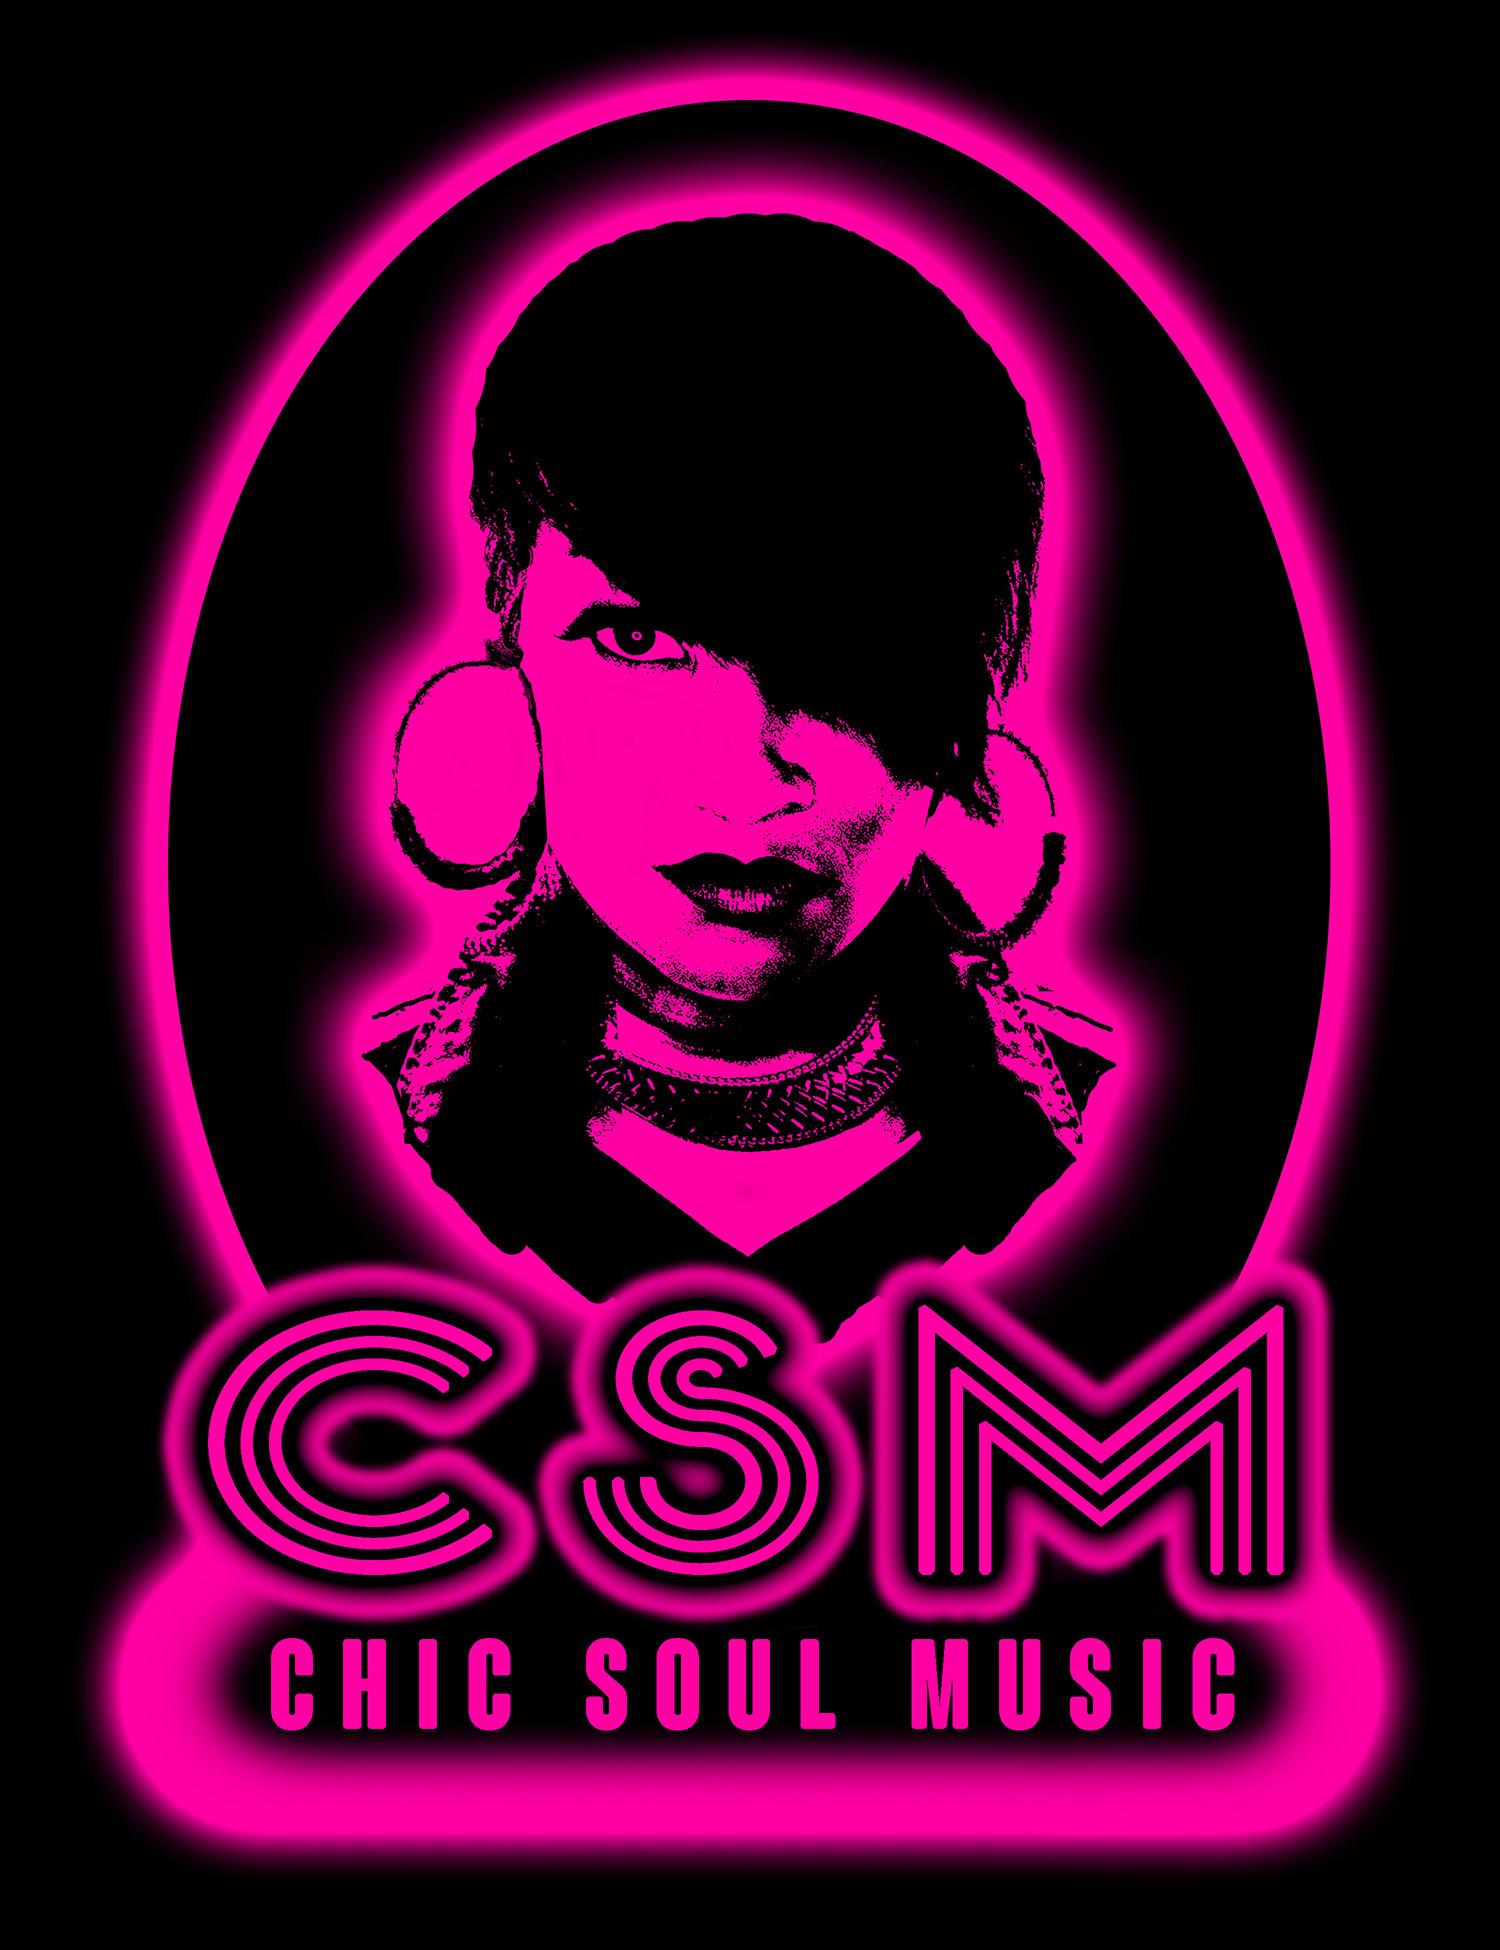 Chic Soul Music Logo 3.jpg